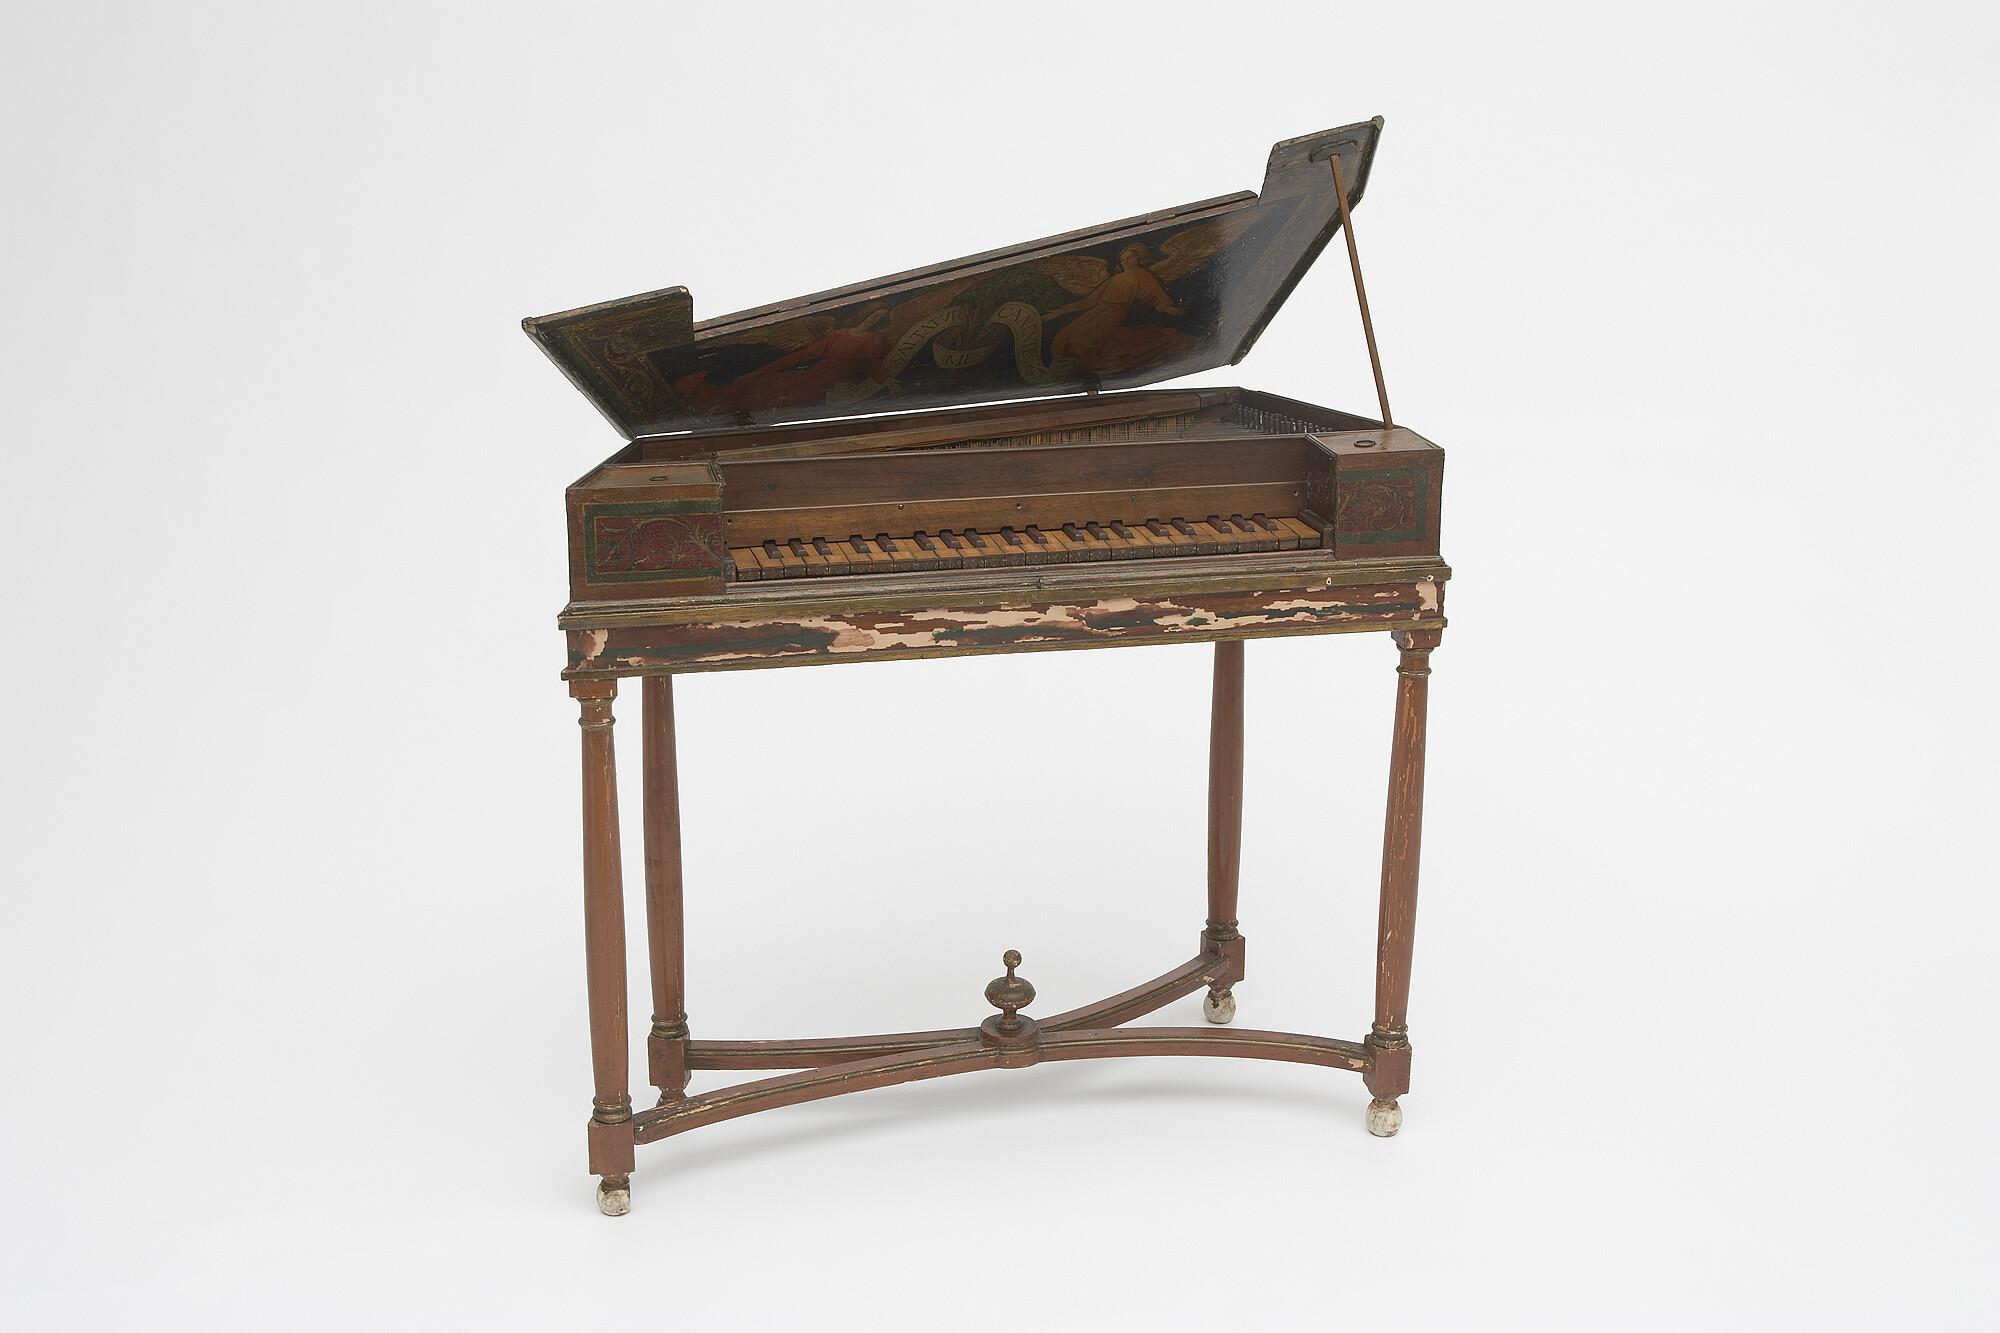 Spinetta, By Maker unknown, late 16th century, Chordophone, Photo credit: Alex Contreras